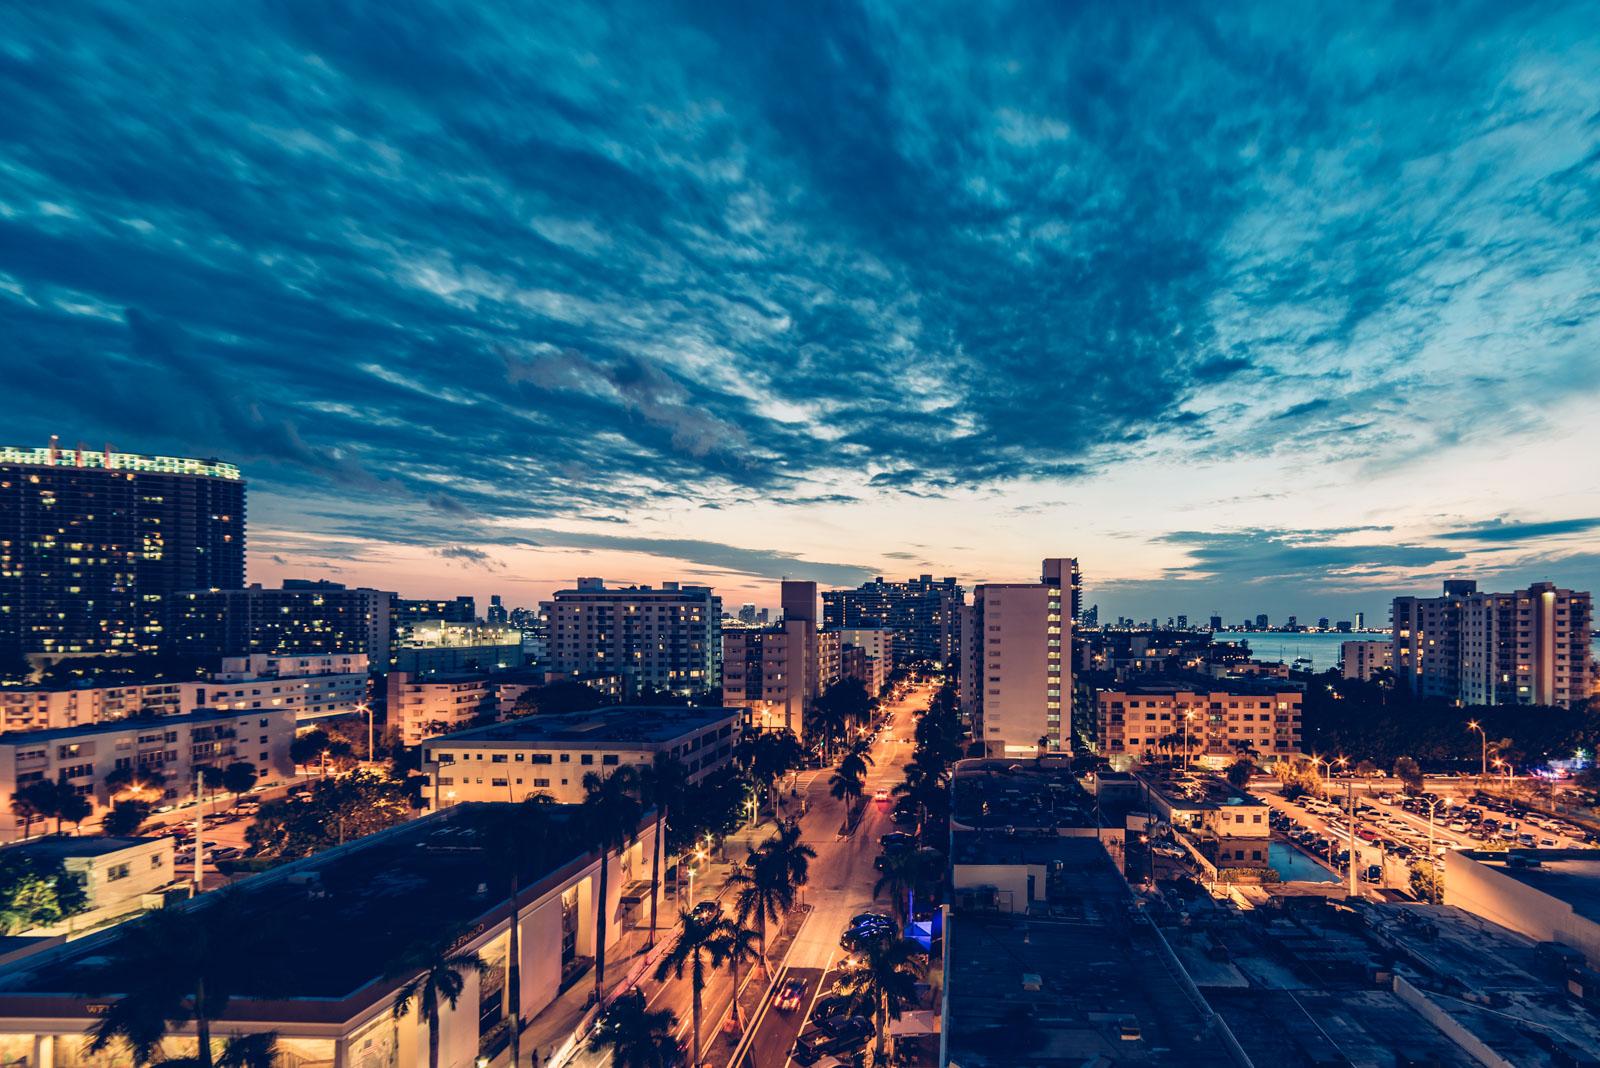 Photo taken by nicefotojournal.de